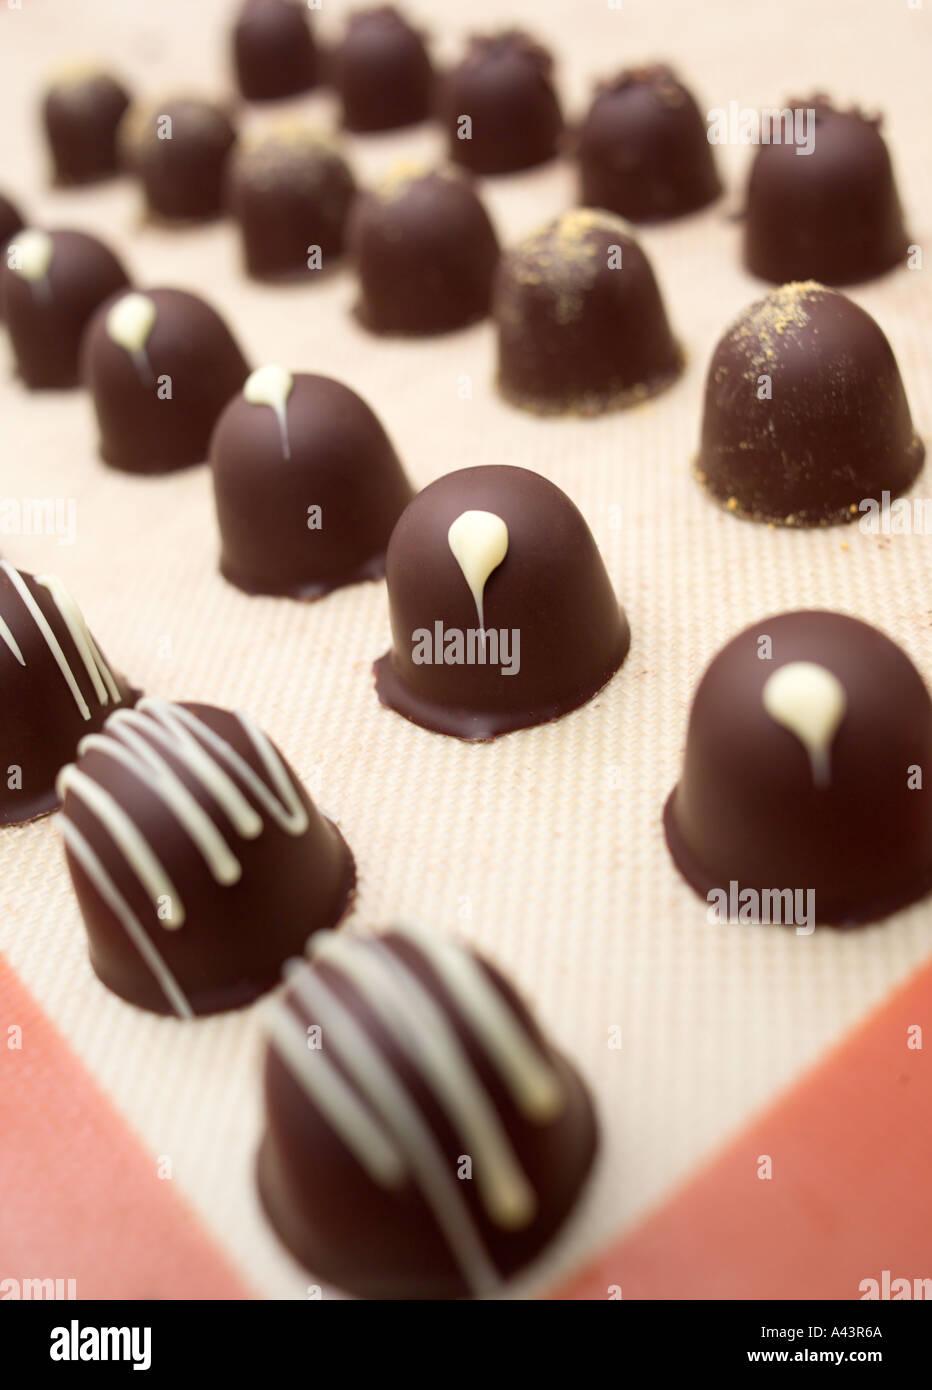 The process of making handmade chocolates - Stock Image